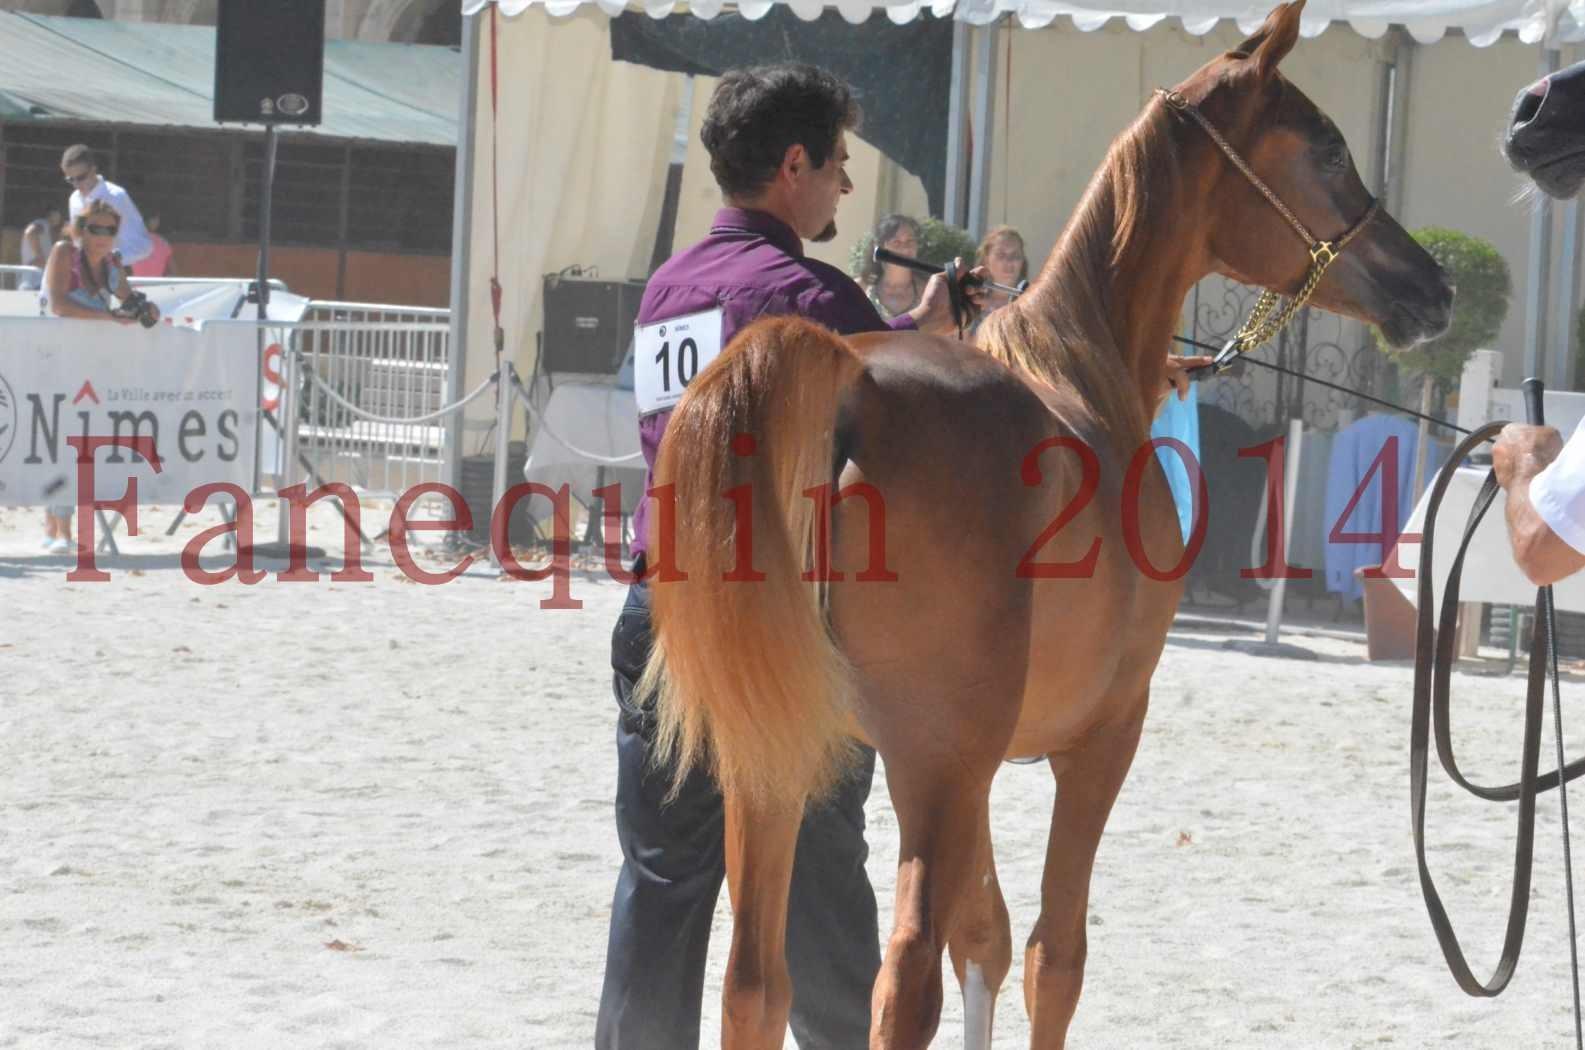 Concours National de Nîmes de chevaux ARABES 2014 - TSAR NERIO - 14